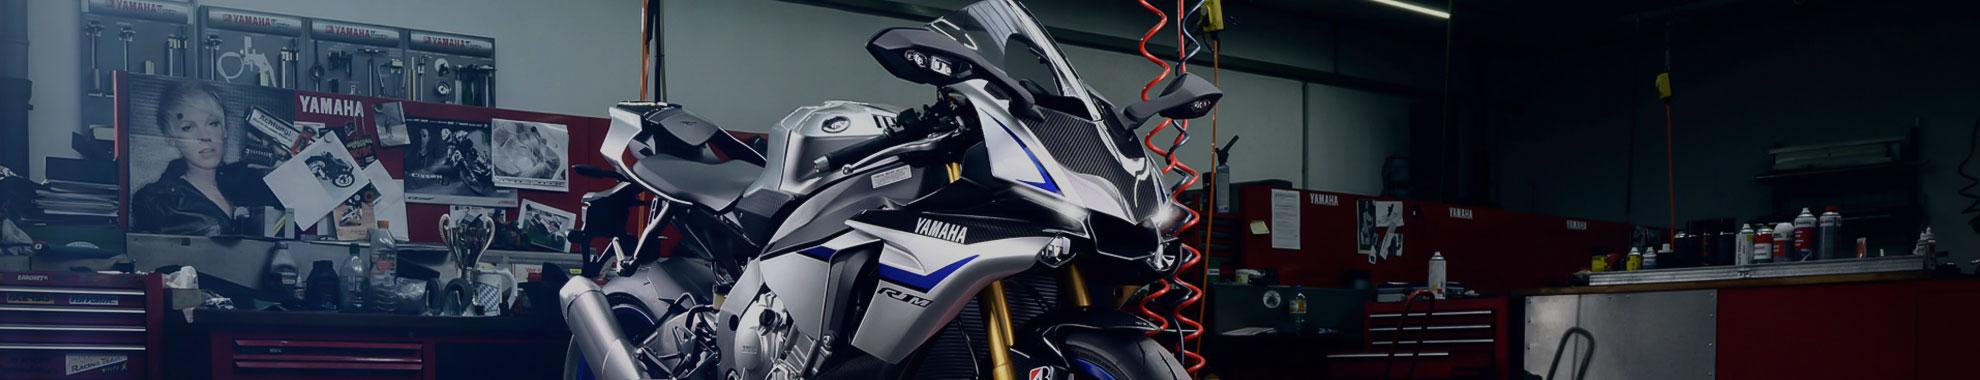 Oryginalne części Yamaha, Sklep Yamaha